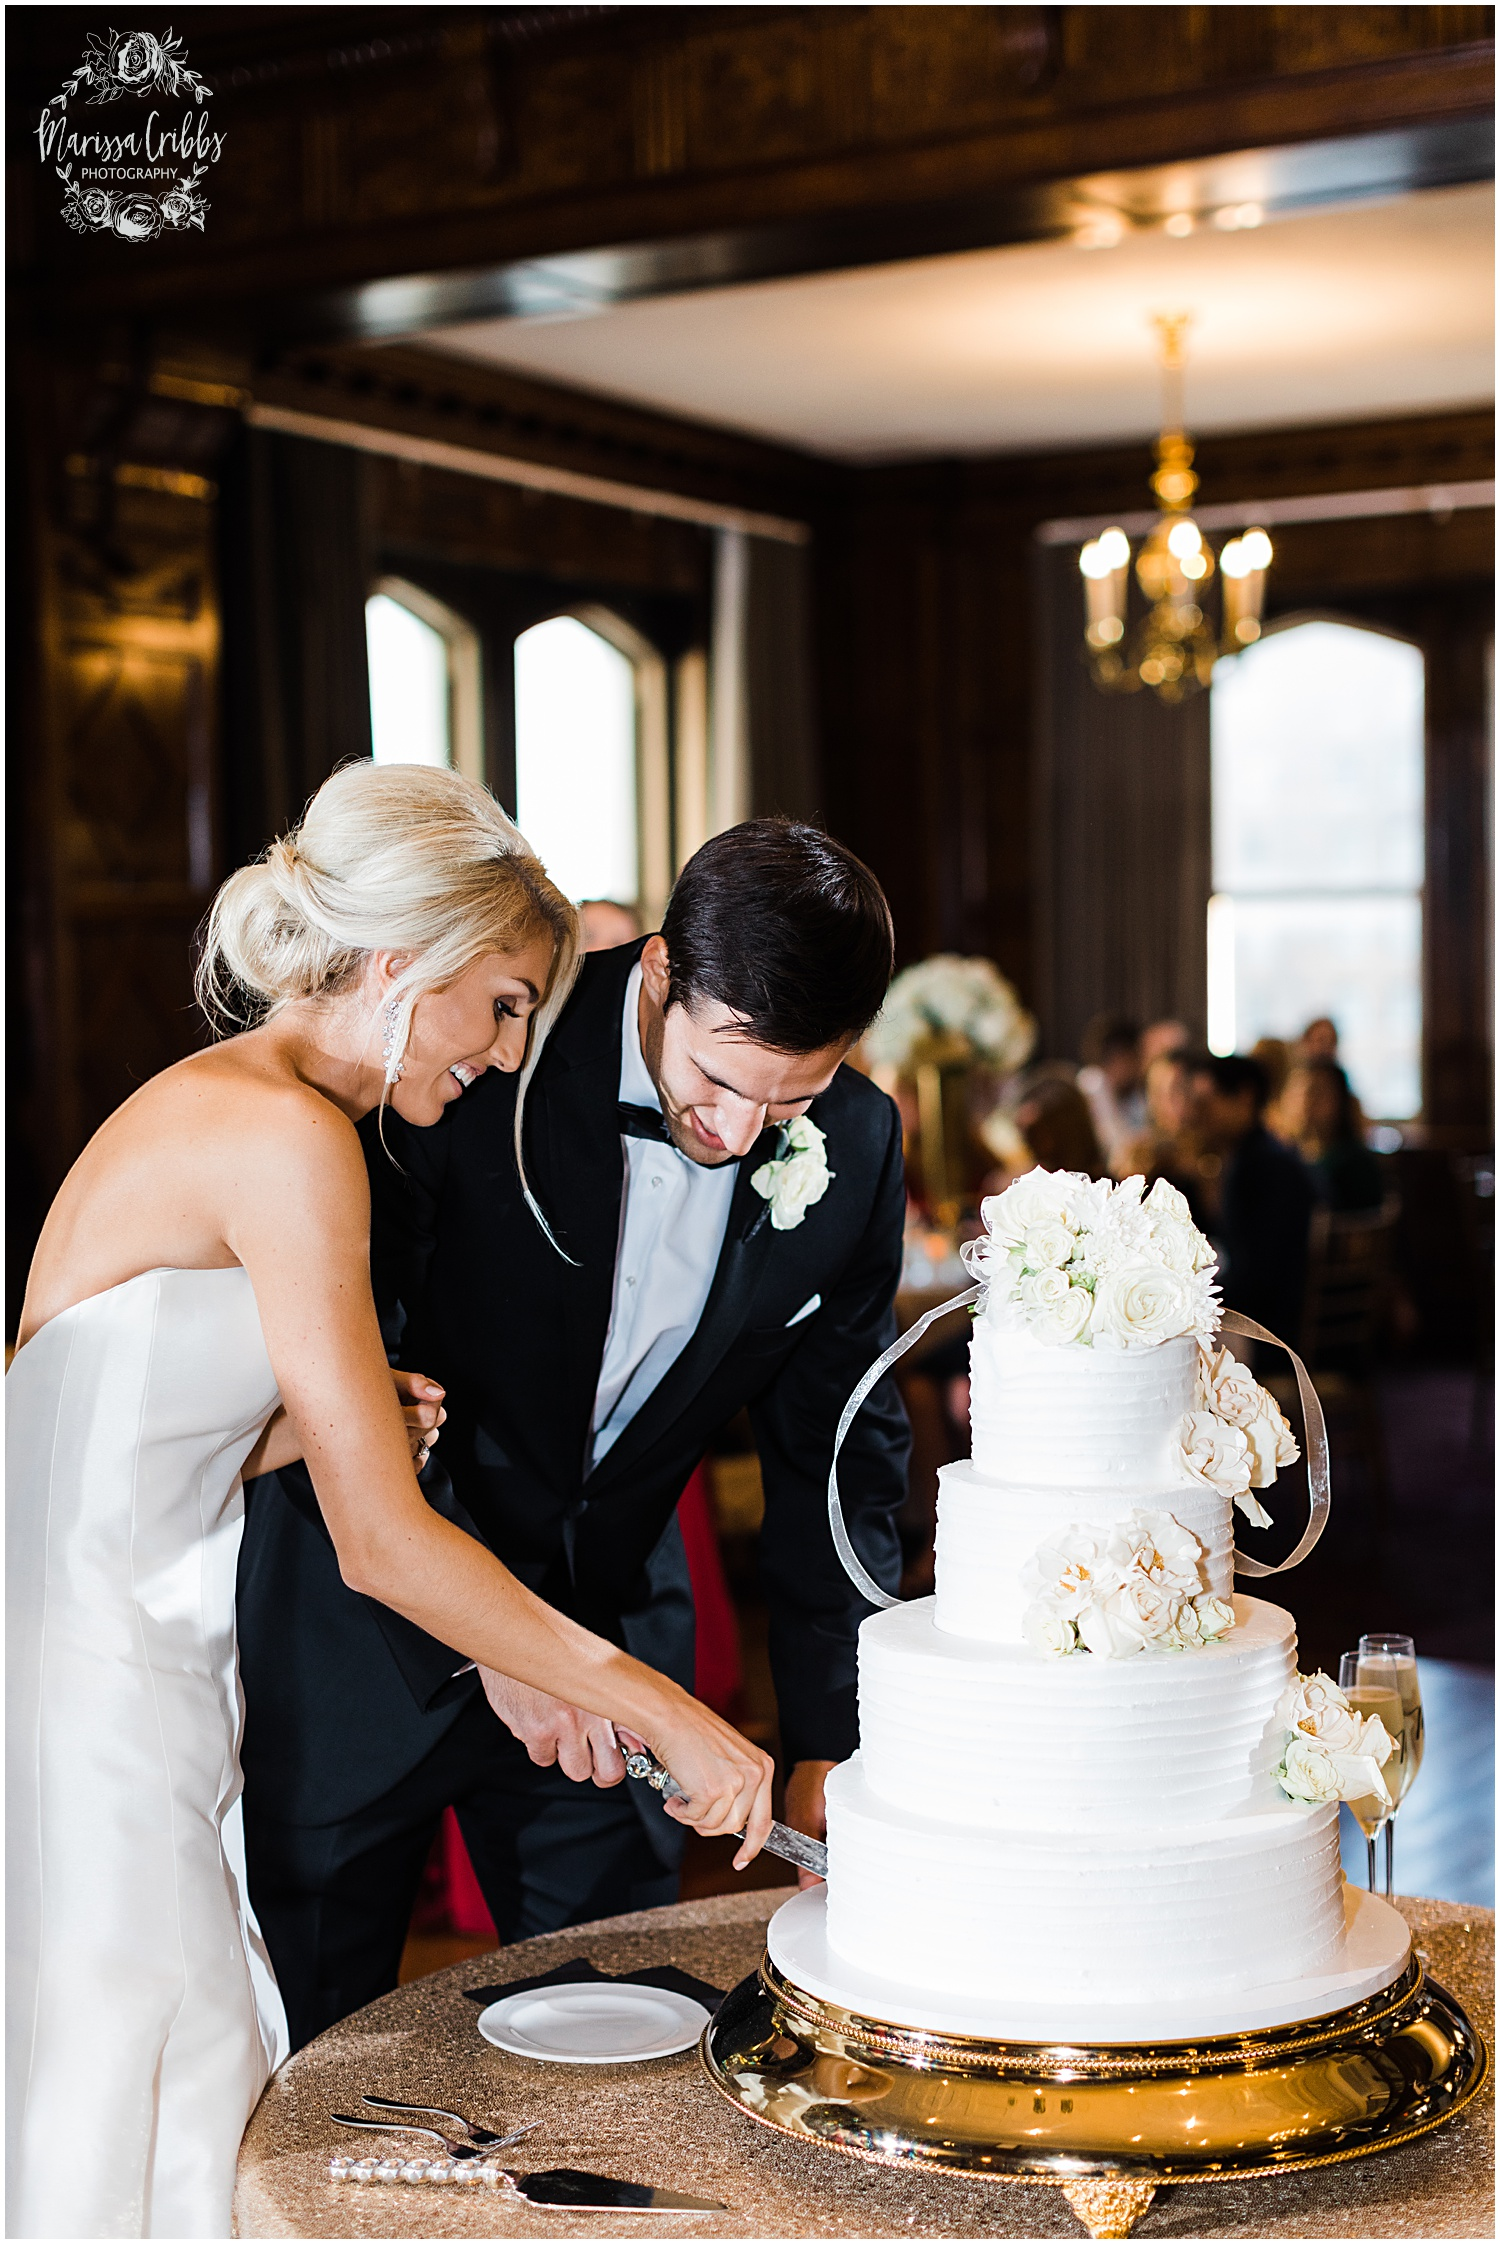 NOLL WEDDING | THE BRASS ON BALTIMORE | MARISSA CRIBBS PHOTOGRAPHY_6359.jpg